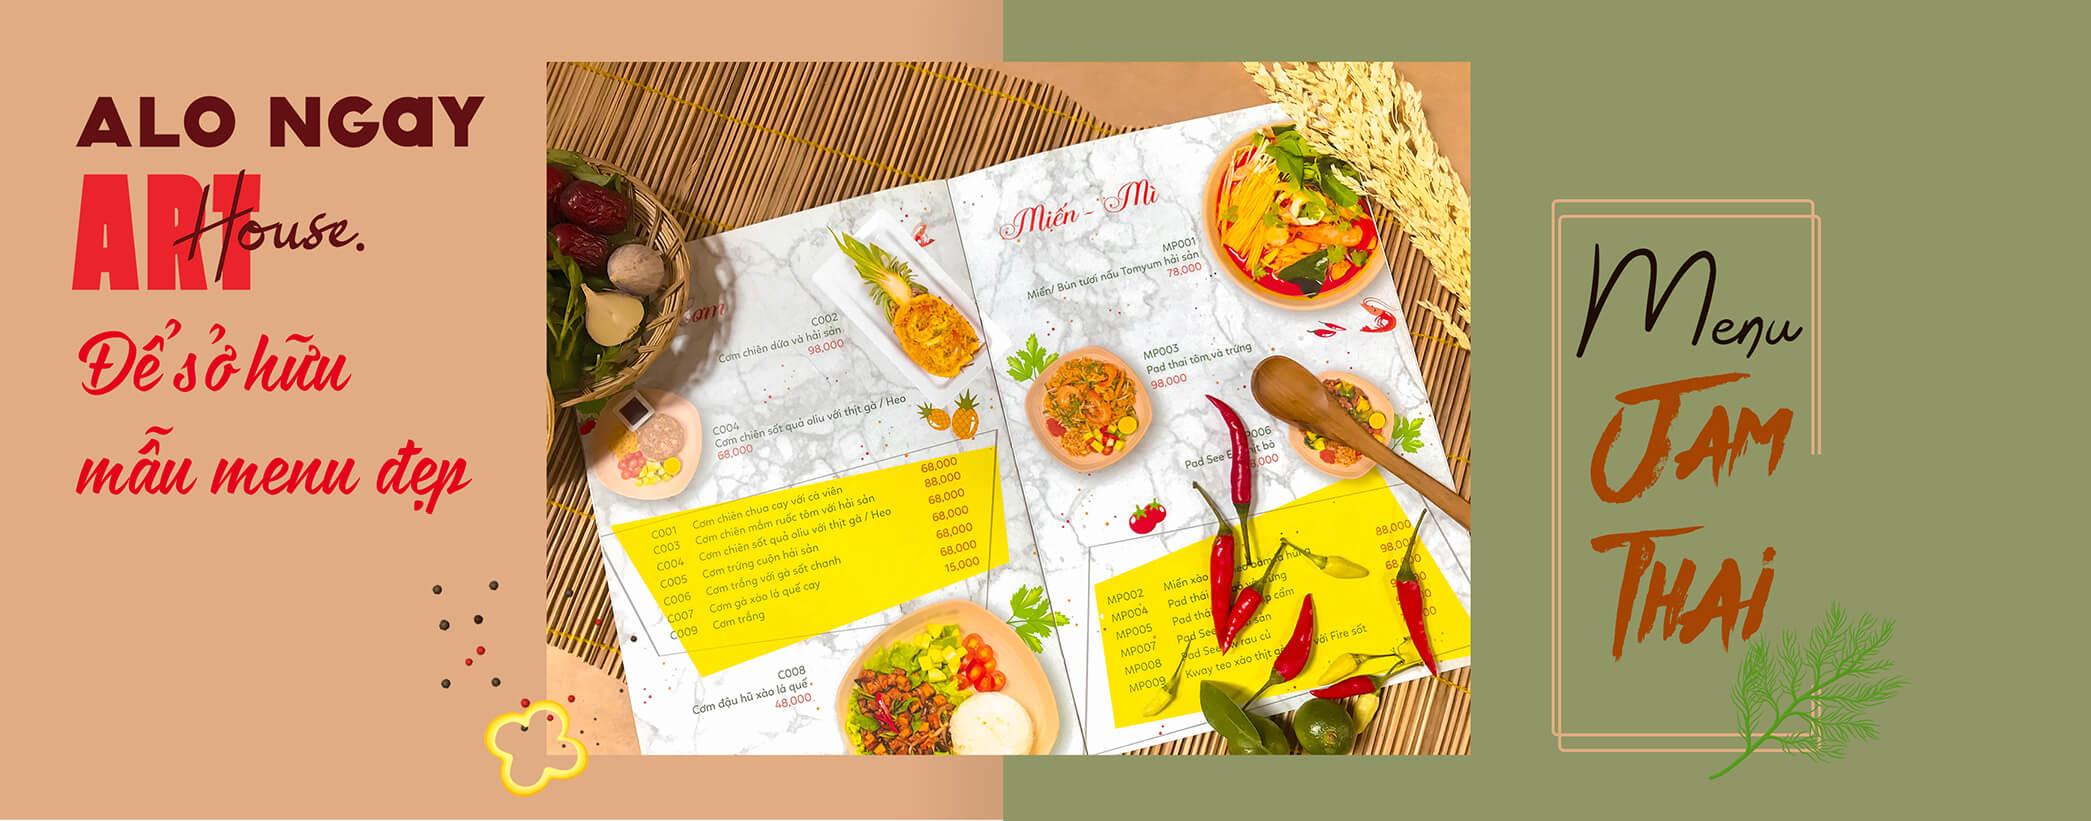 in-menu-dong-ghim-giua-2